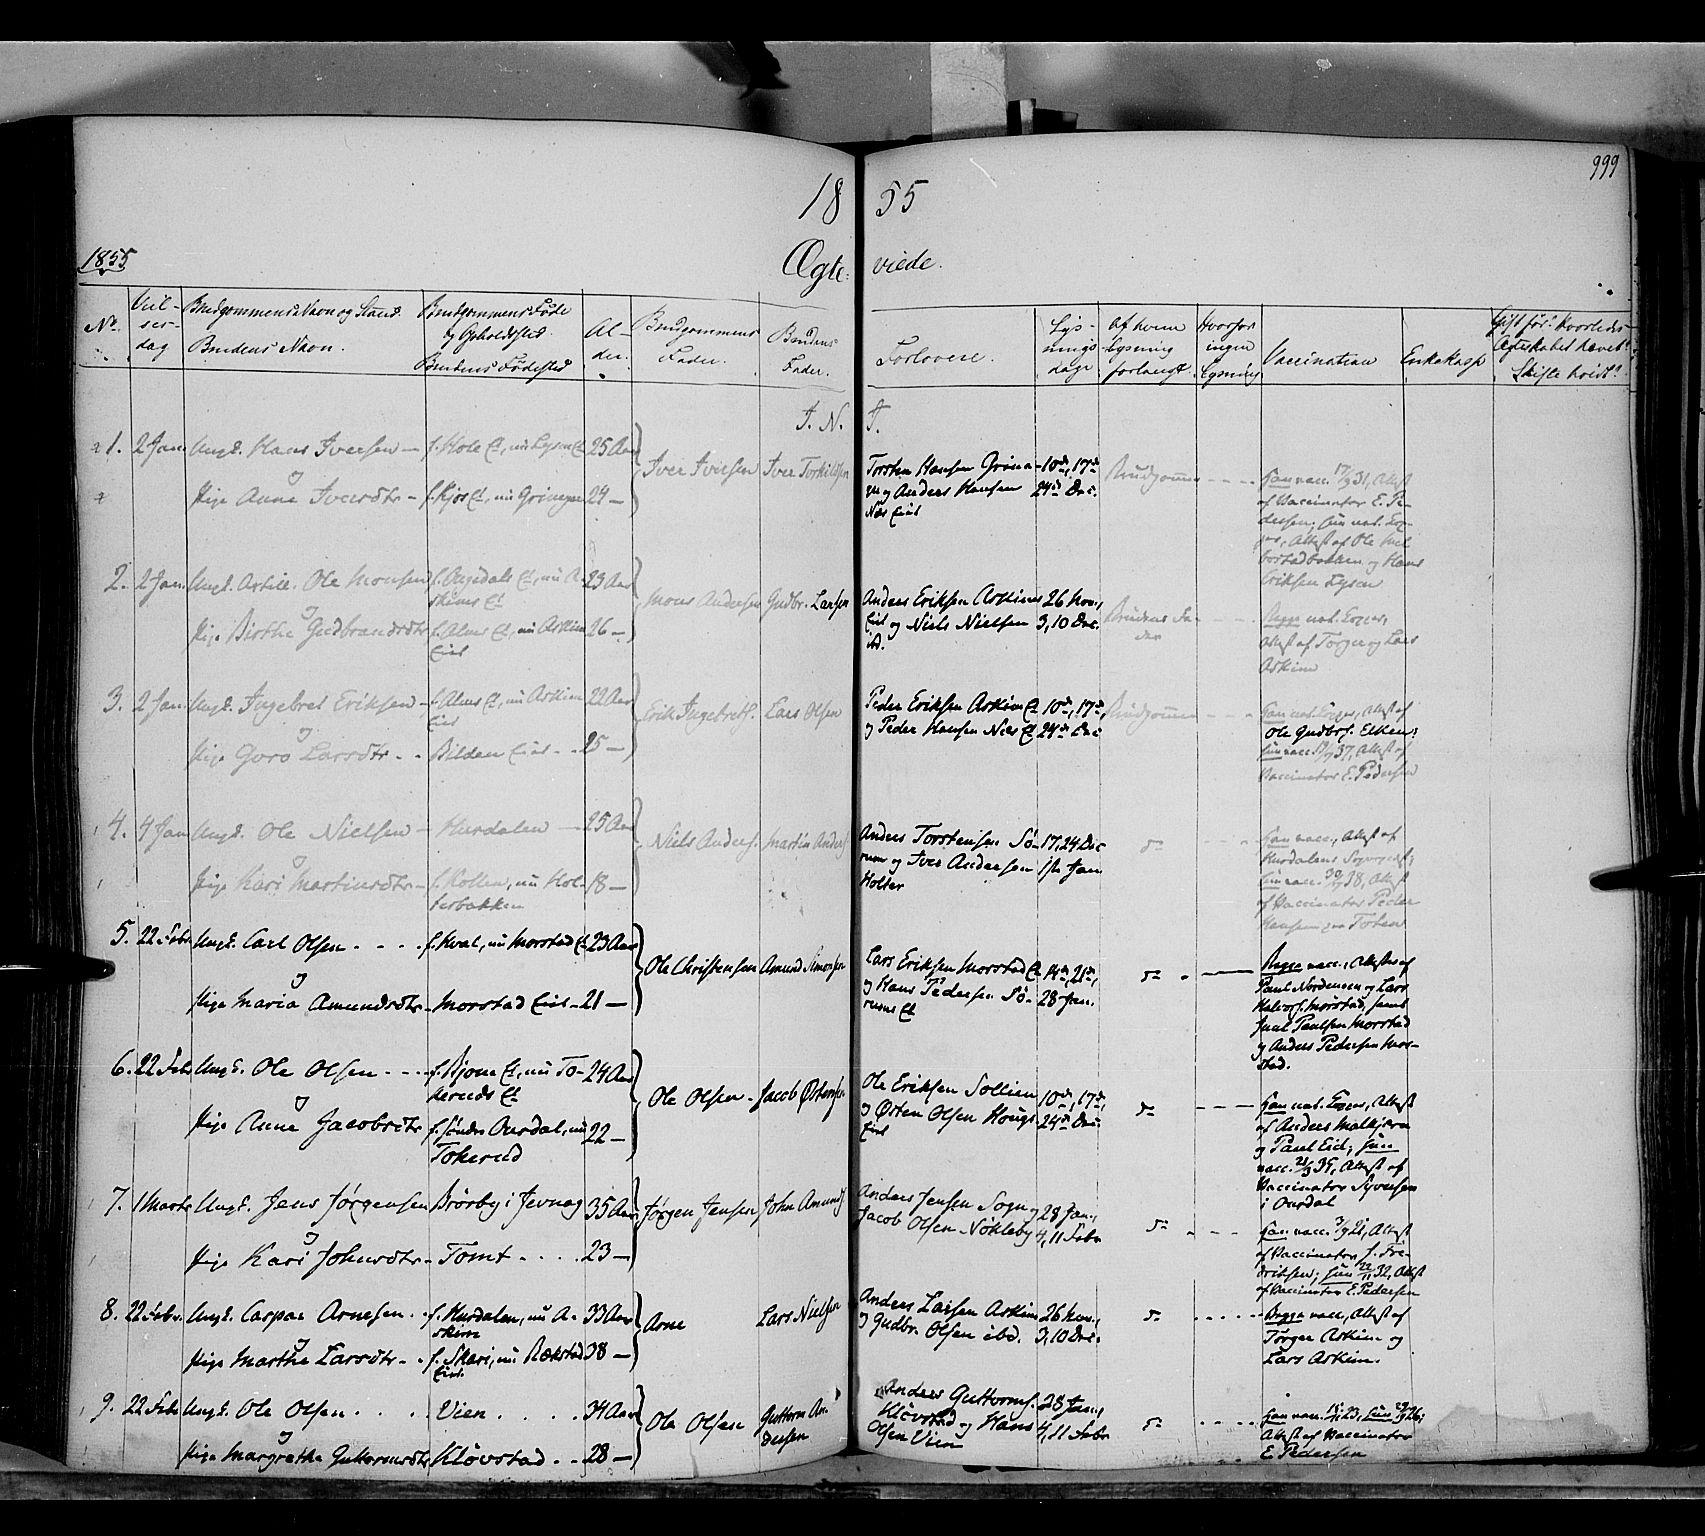 SAH, Gran prestekontor, Ministerialbok nr. 11, 1842-1856, s. 998-999